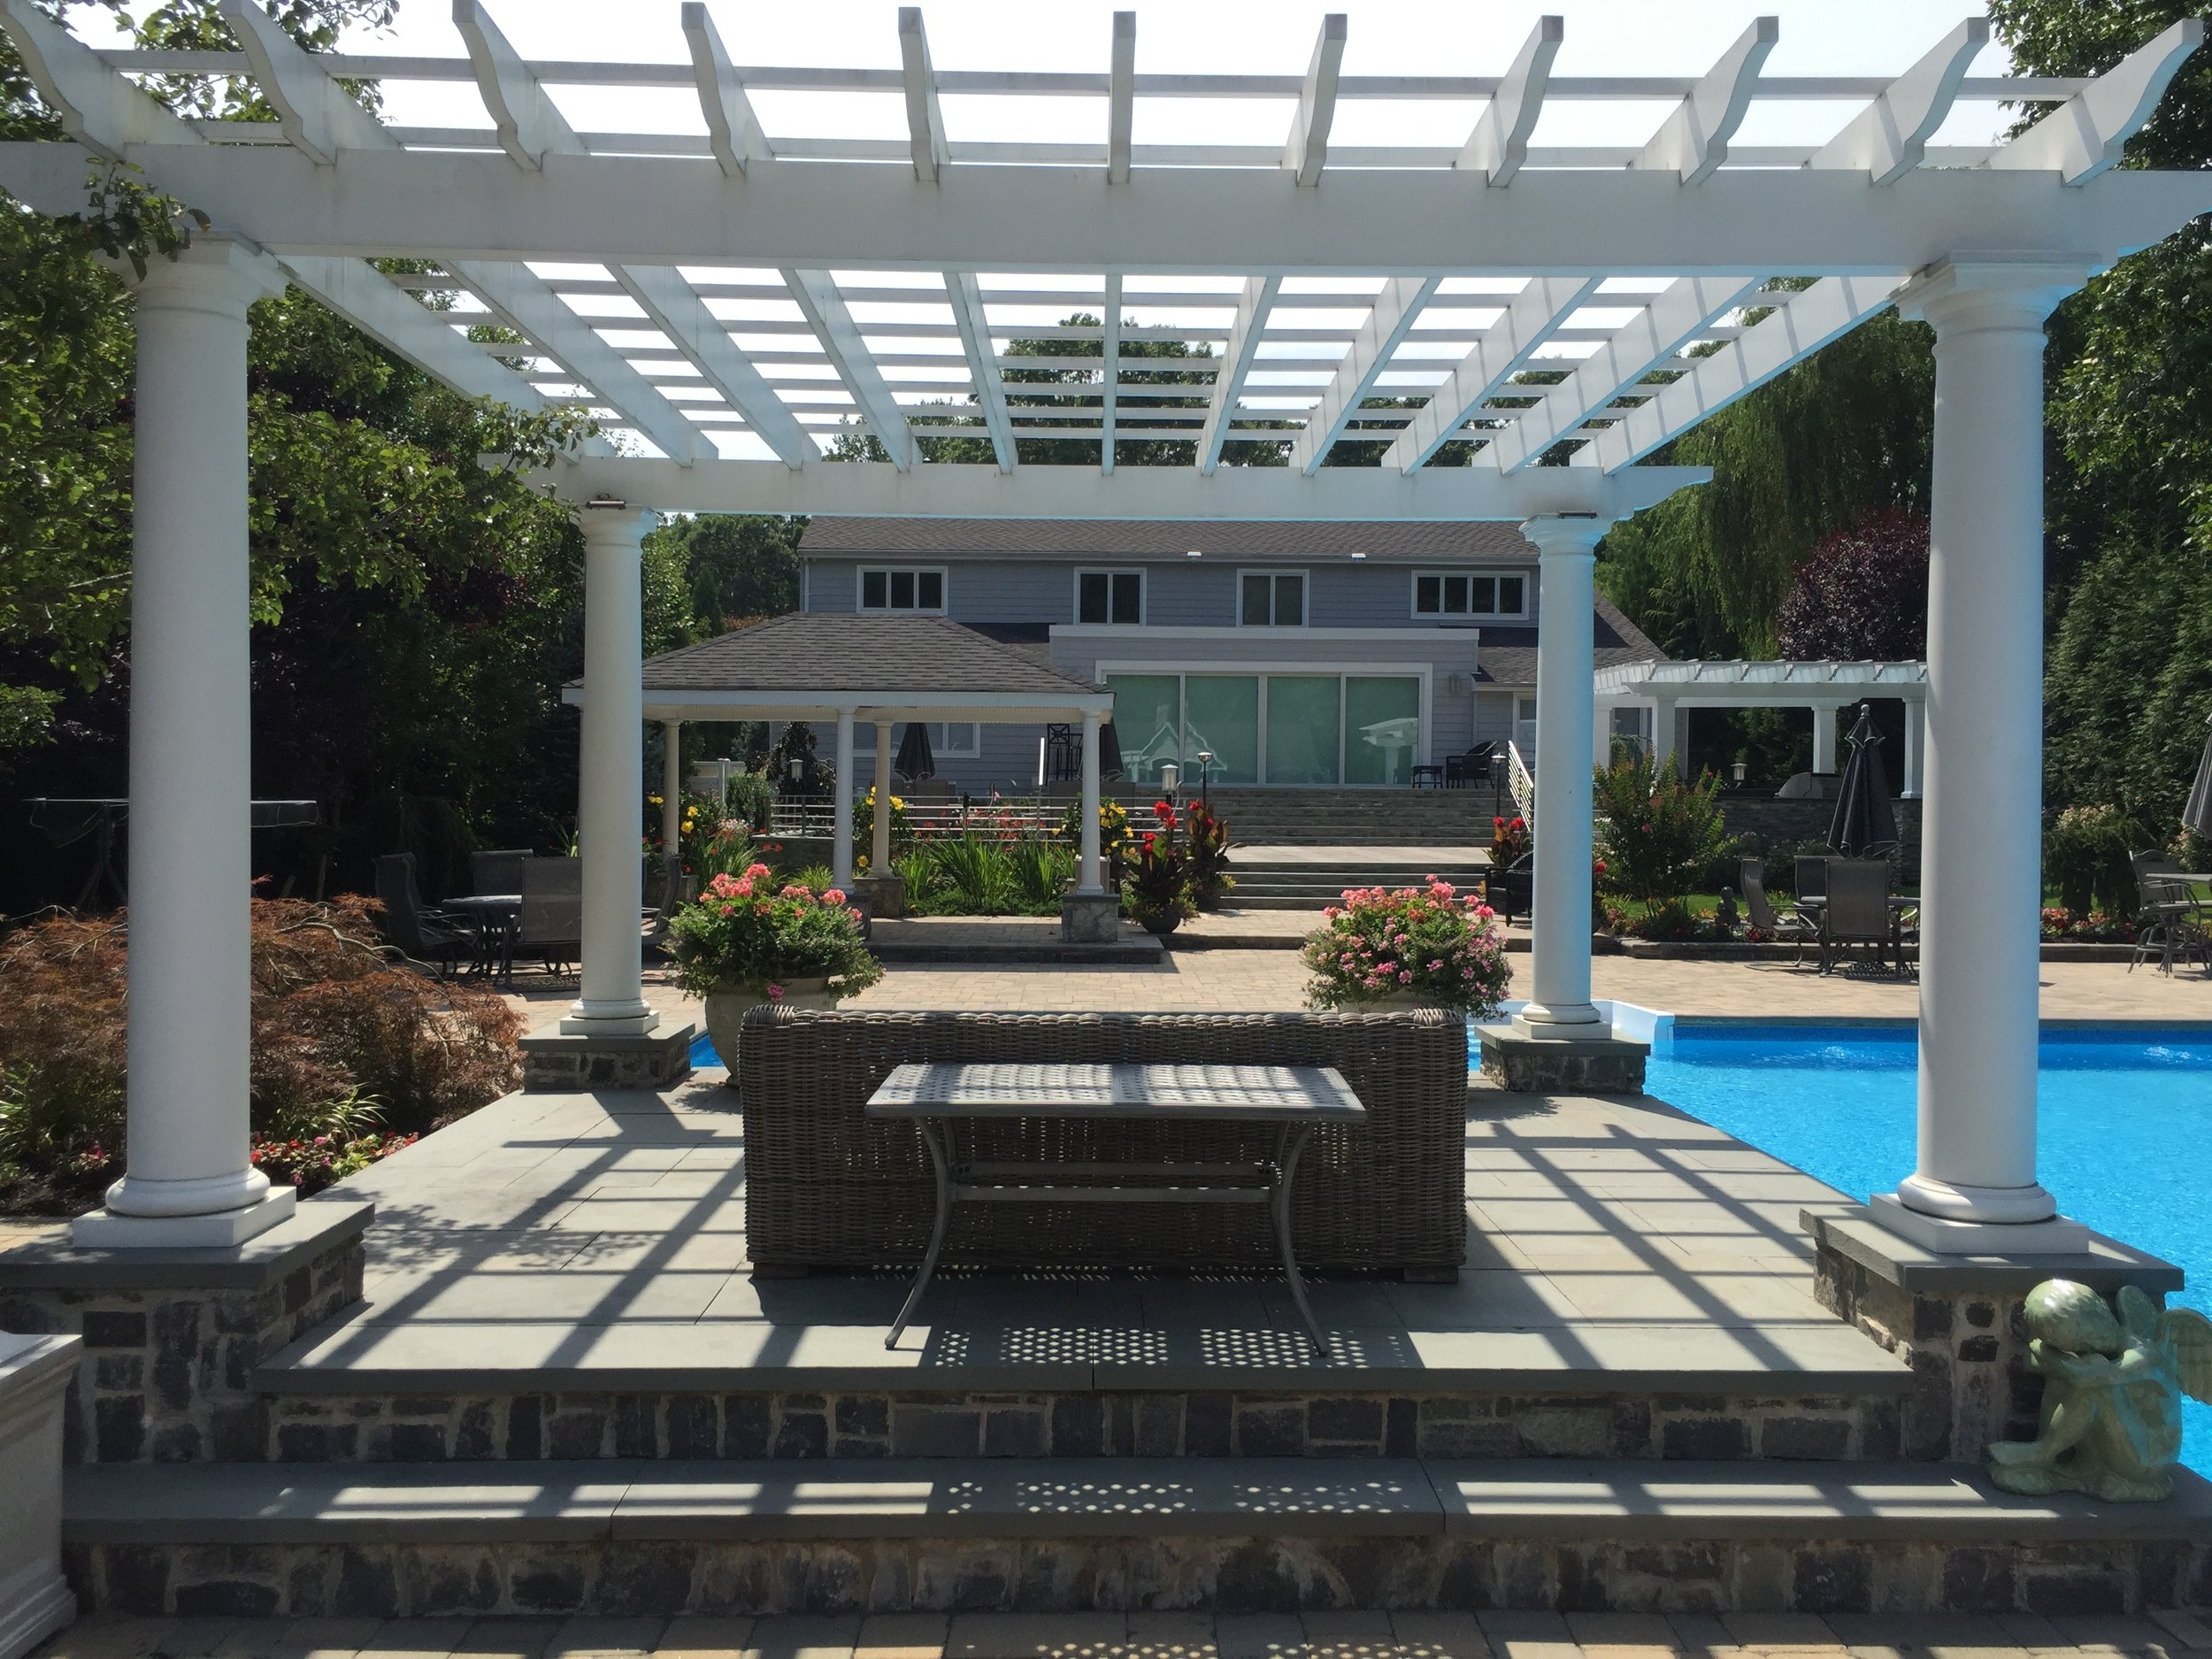 Professional pergola landscapedesign company in Long Island, NY